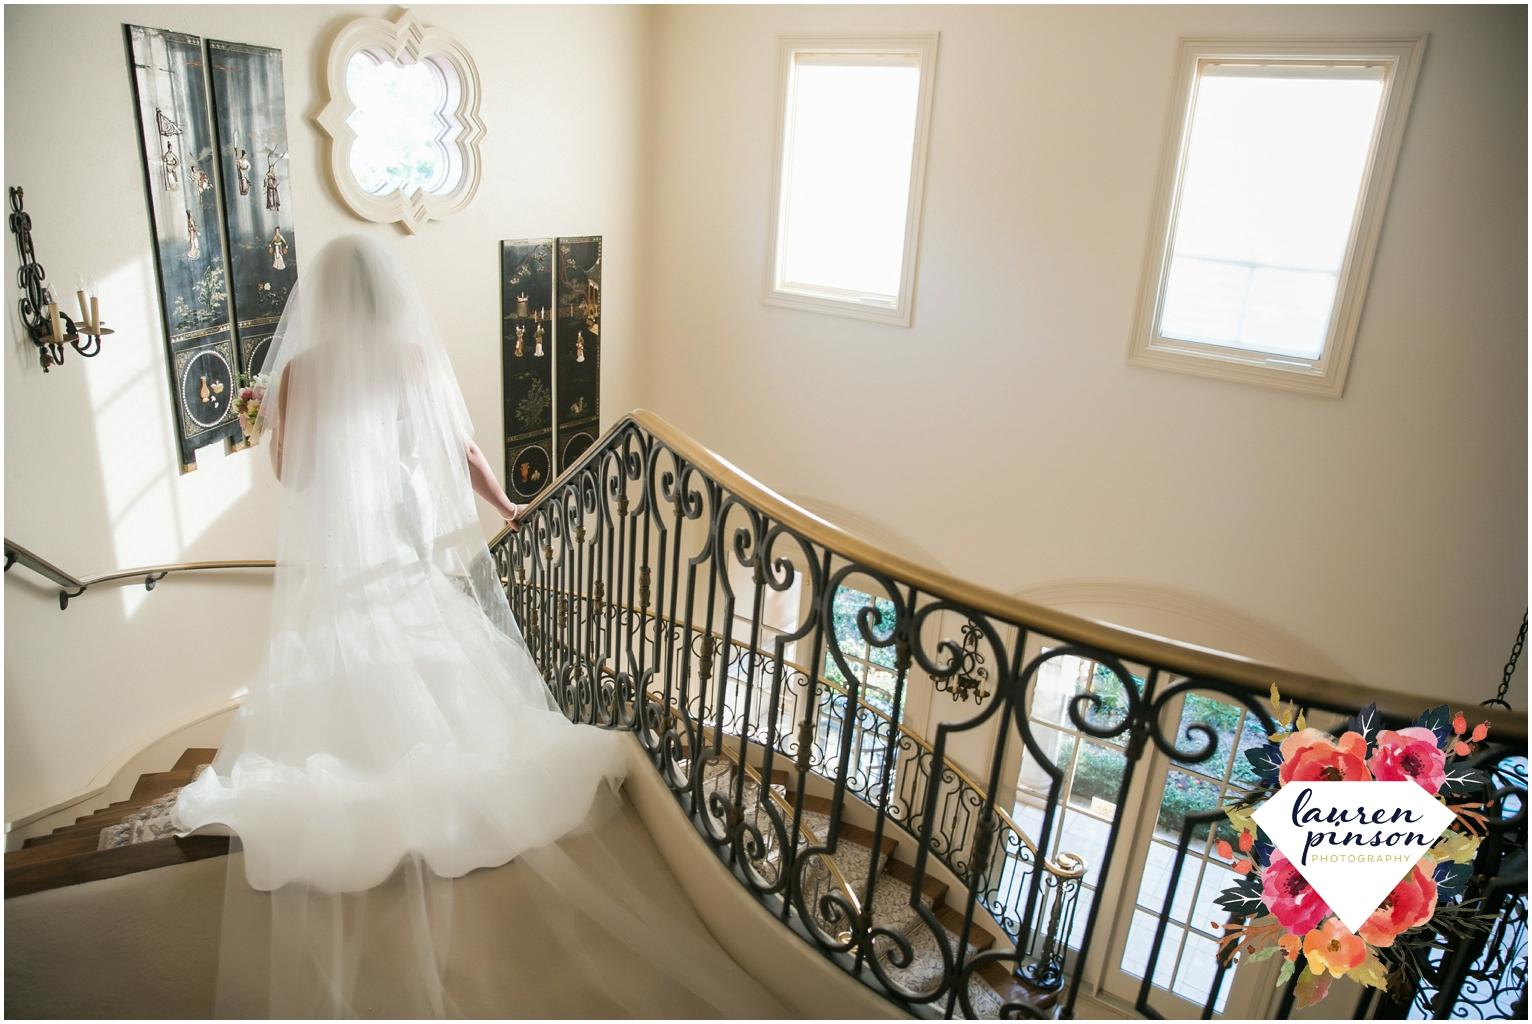 wichita-falls-wedding-photographer-kemp-center-at-the-forum-photography_0980.jpg